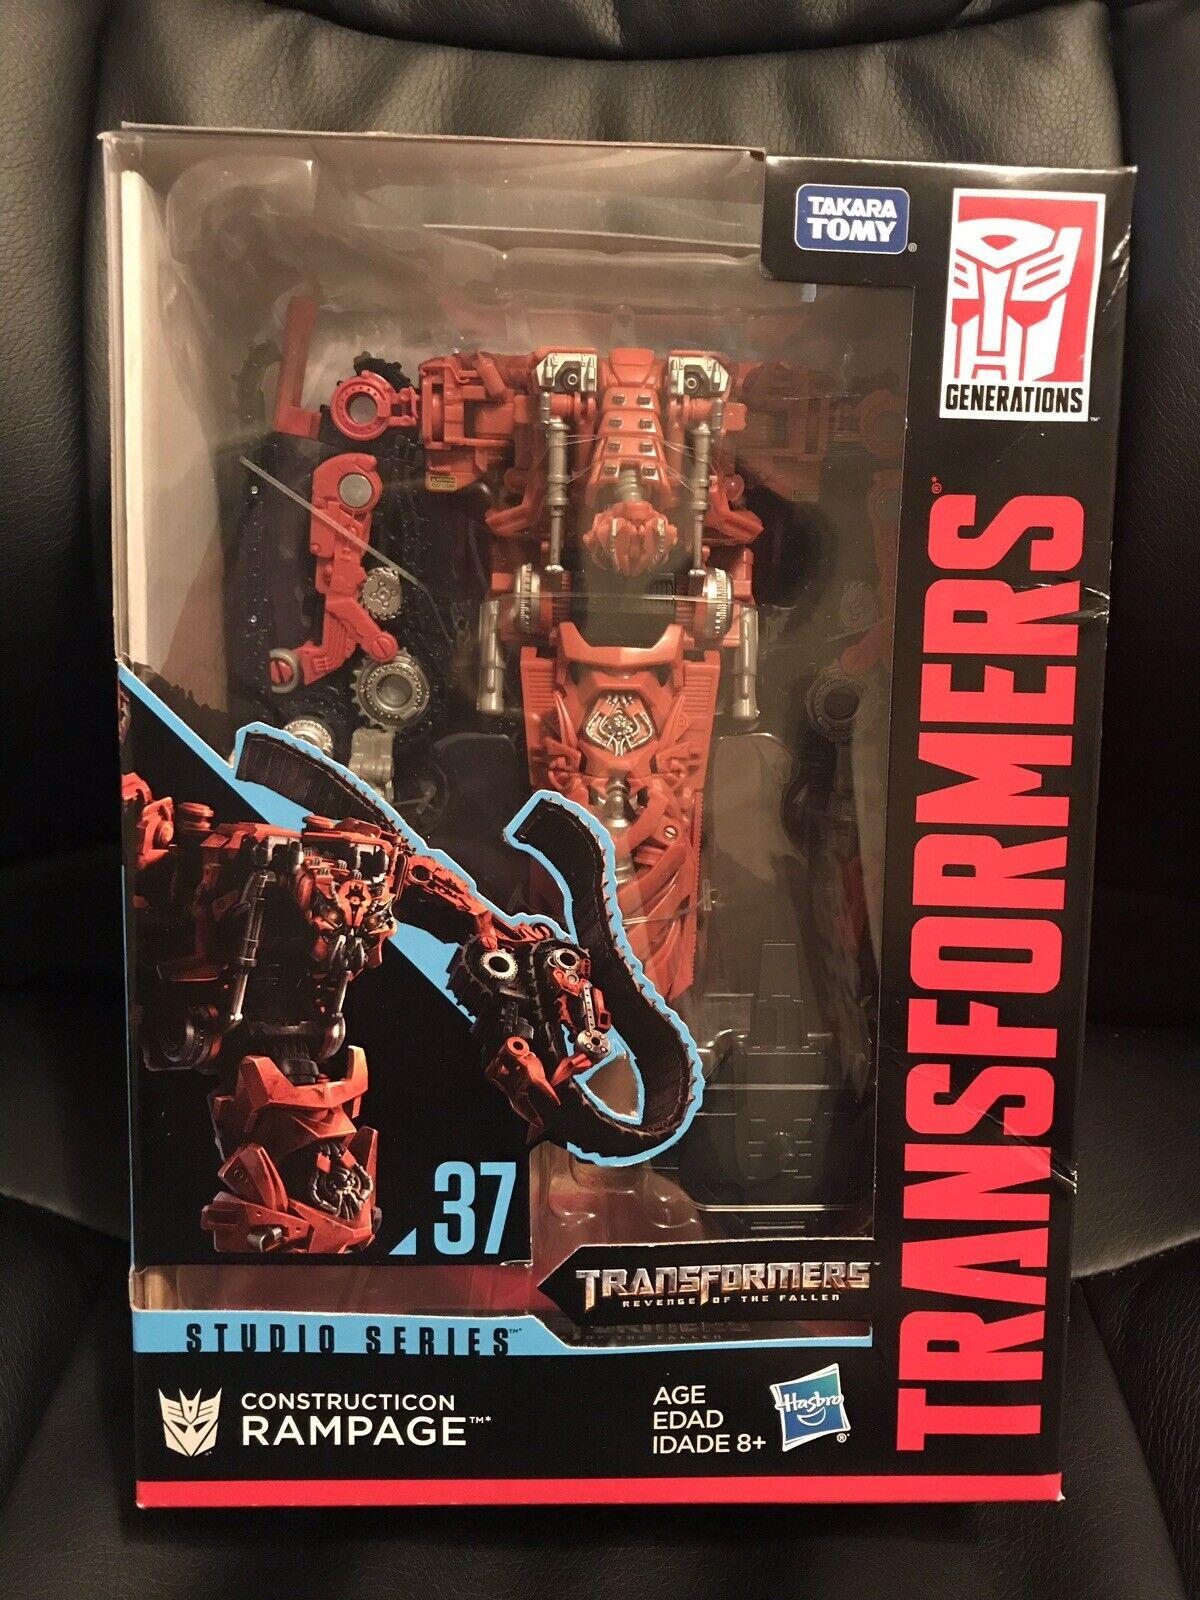 Transformers Movie Studio Series Voyager Class - Constructicon Rampage